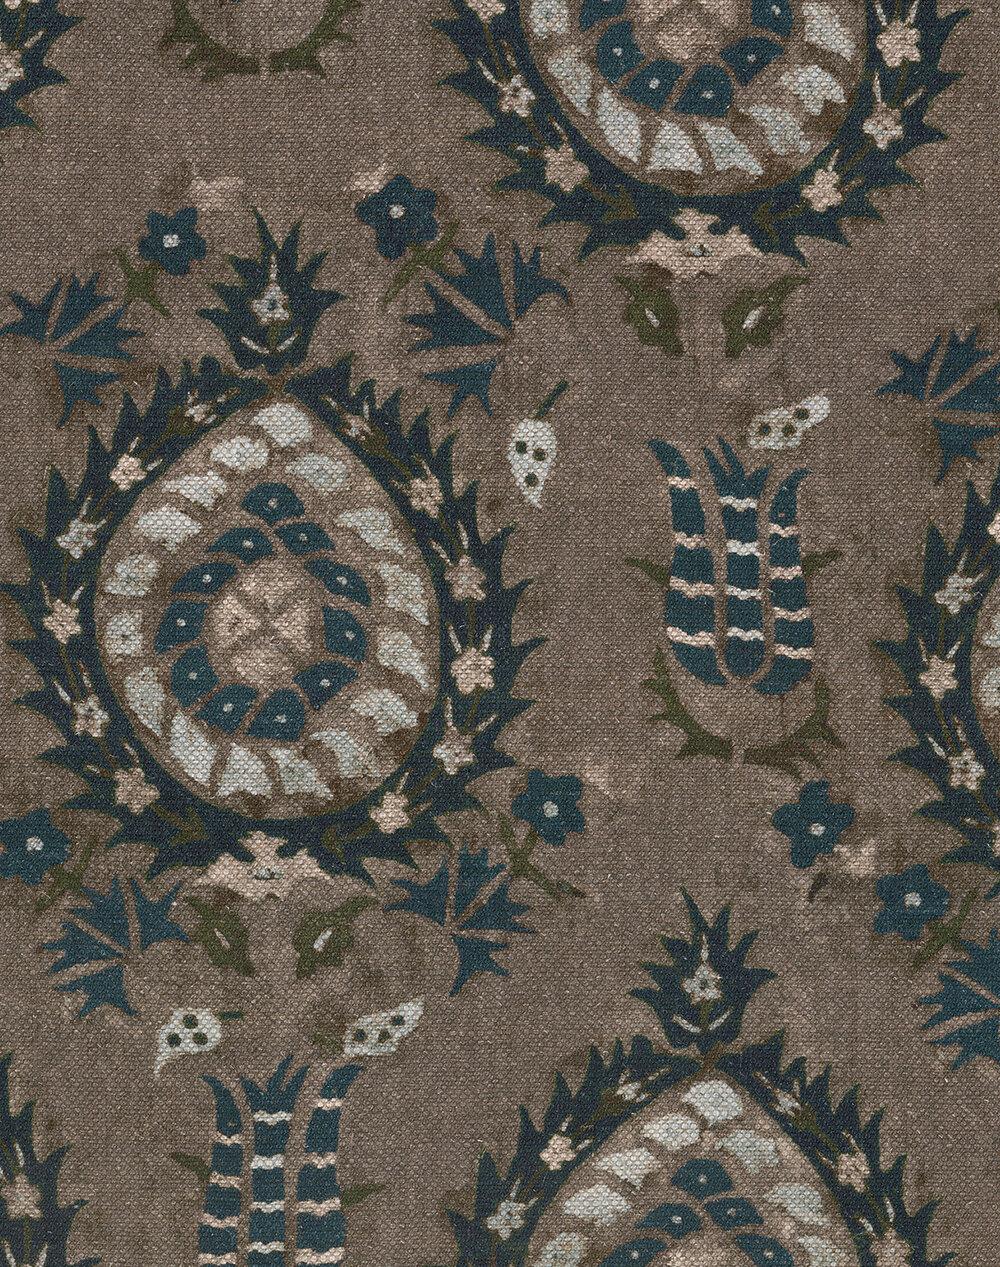 Flourish Fabric - Dapple Grey - by Mind the Gap